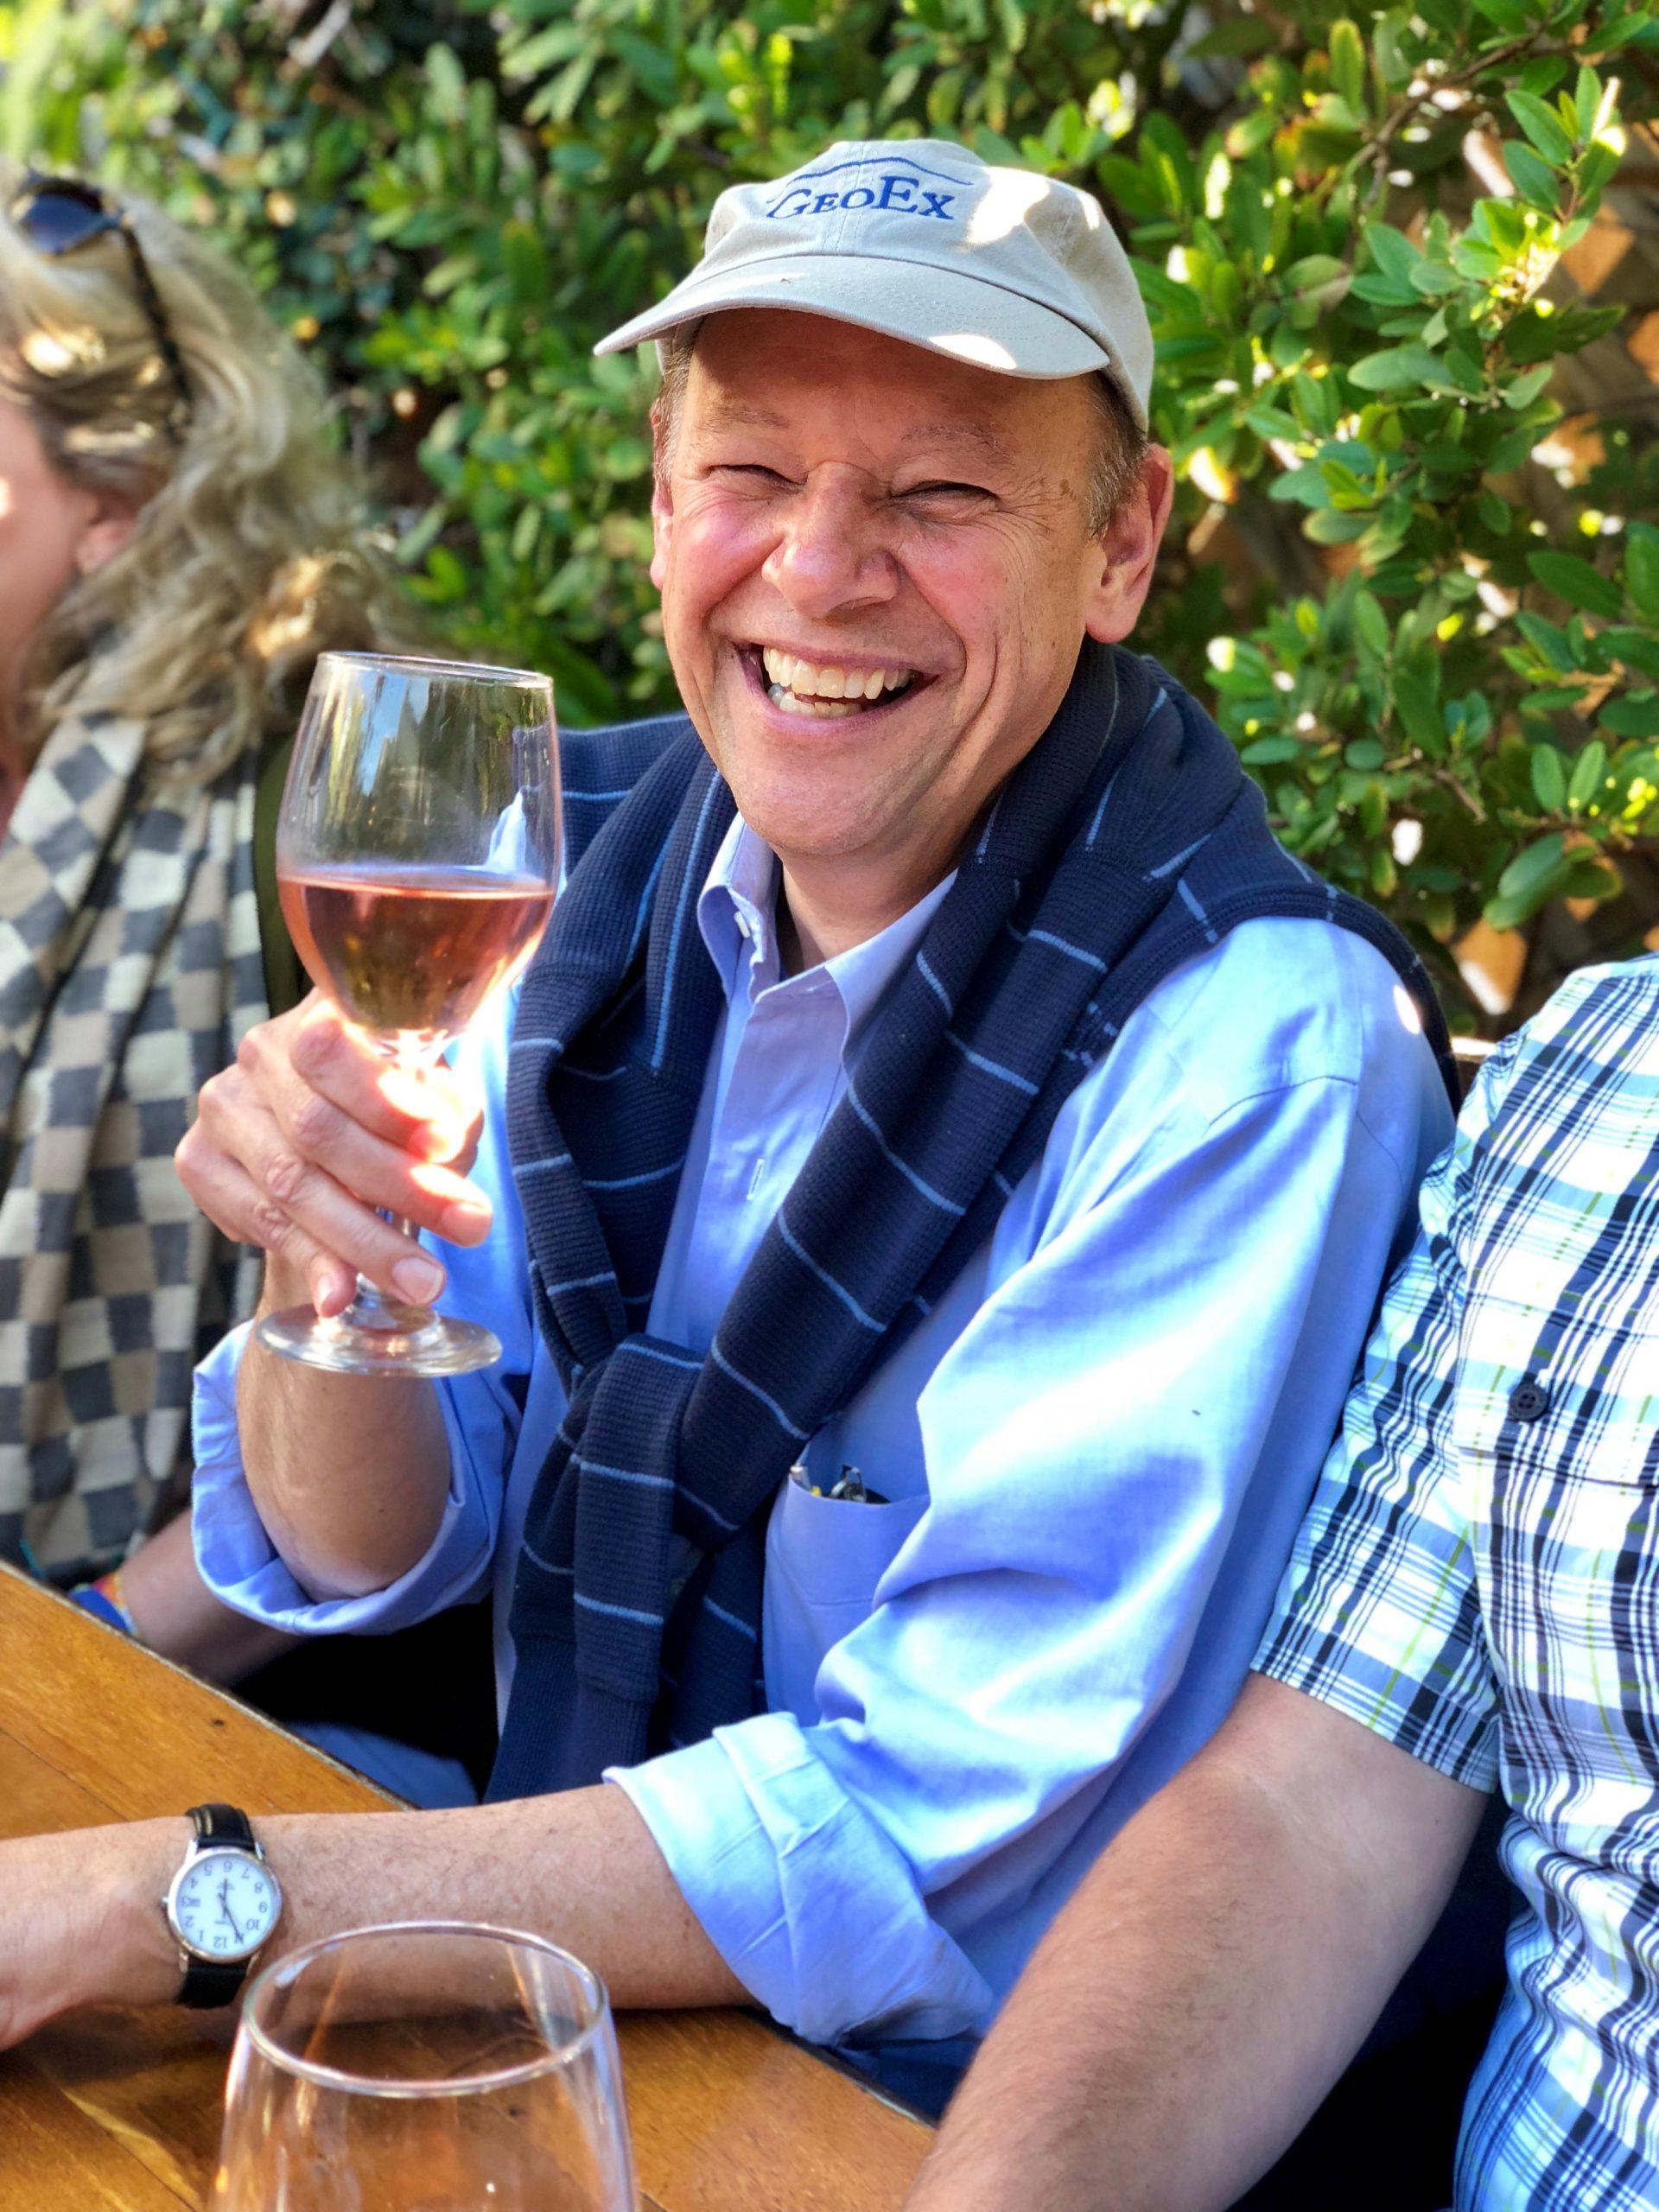 GeoEx Trip Leader raises a glass of wine